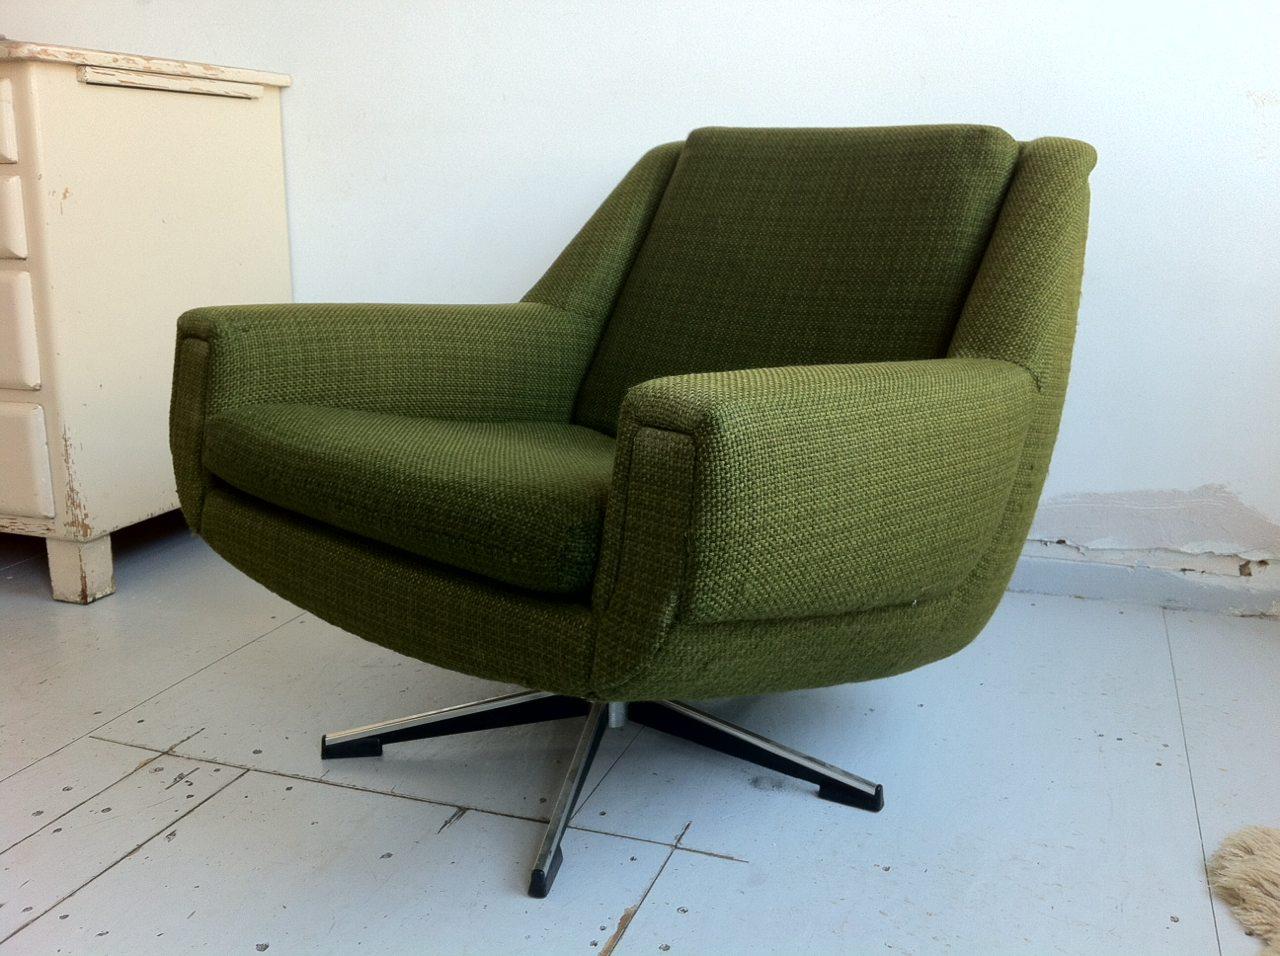 76 Groene Fauteuil  groene fauteuil perfect groene